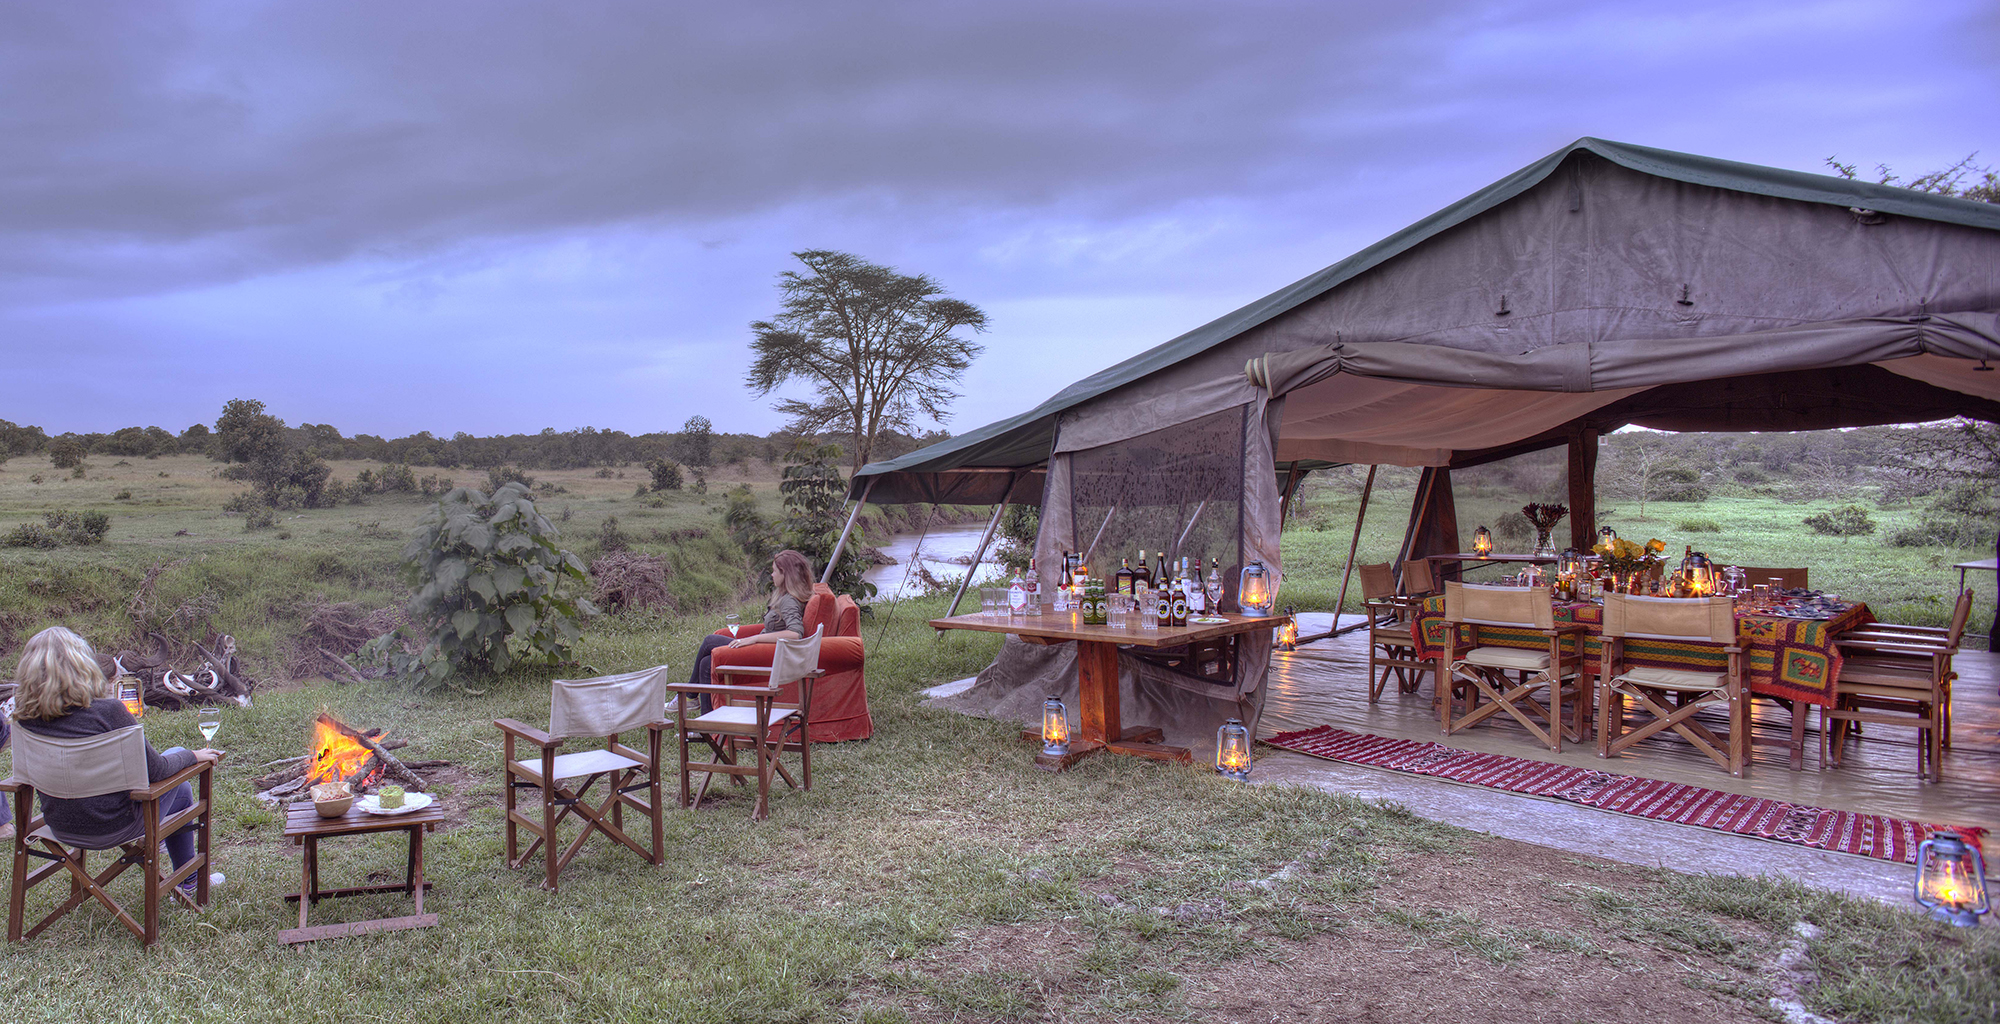 Kenya-Ol-Pejeta-Guest-Area-Campfire